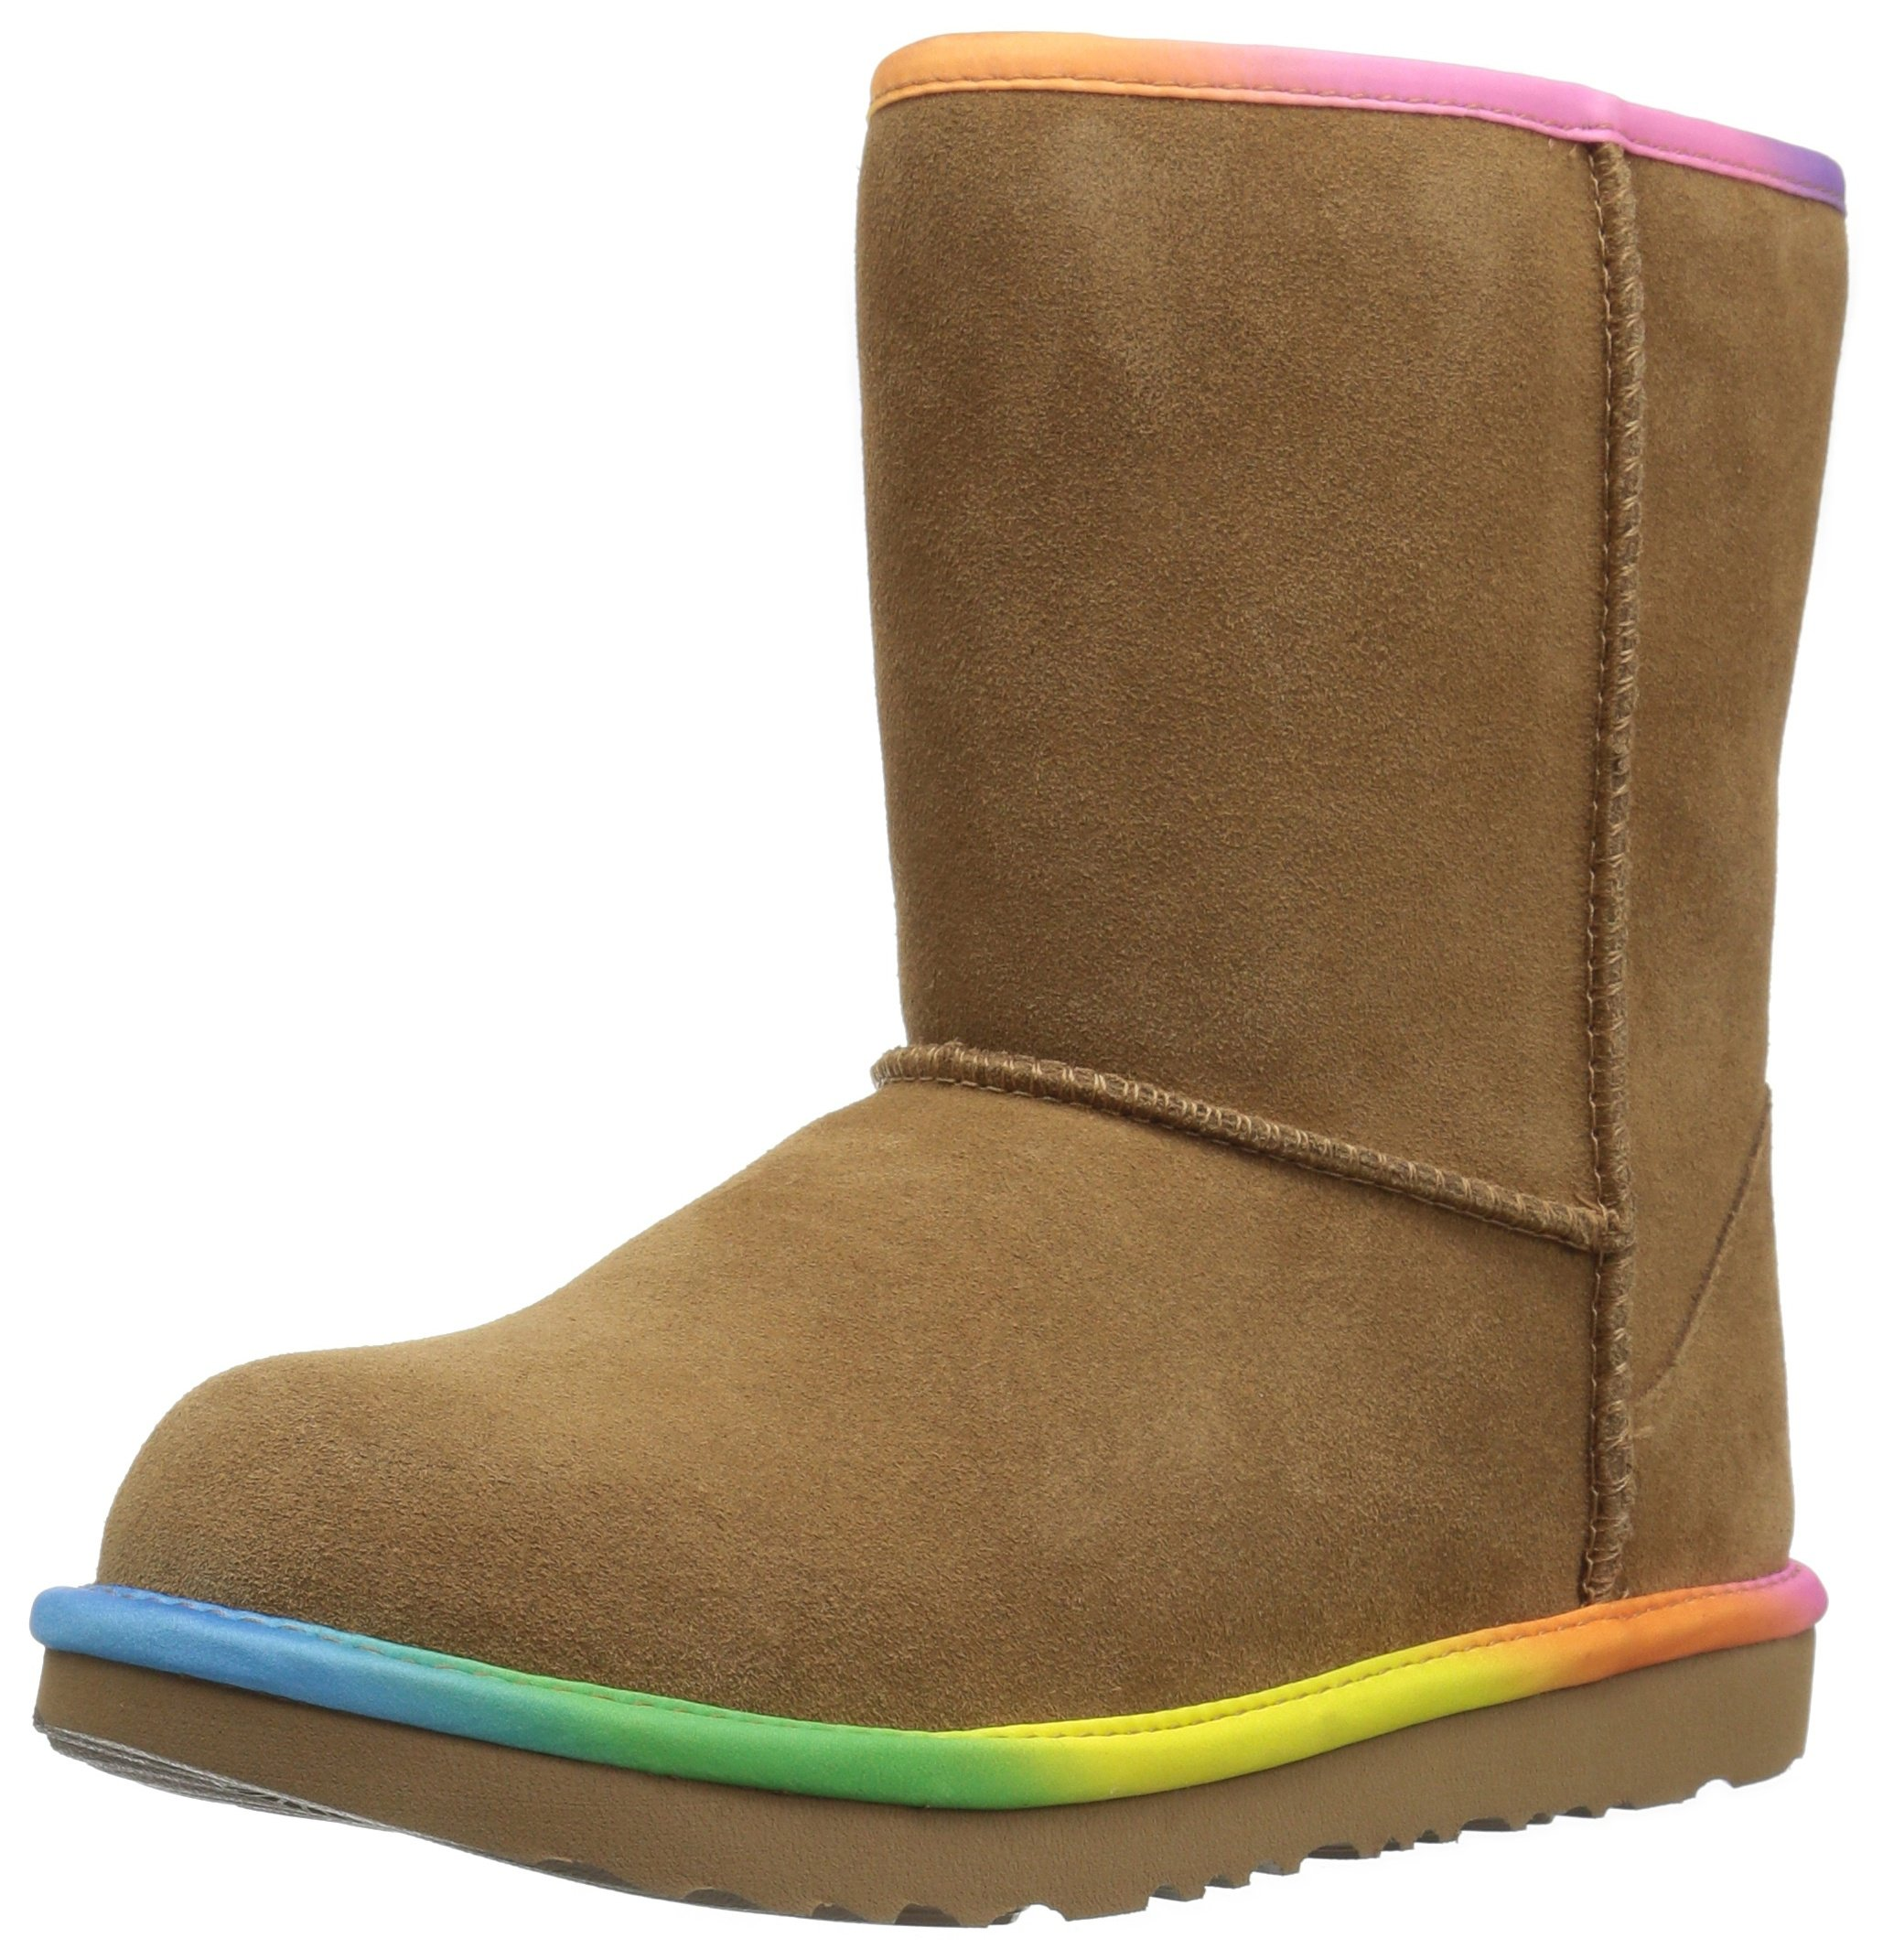 UGG Girls K Classic Short II Rainbow Pull-On Boot, Chestnut, 13 M US Little Kid